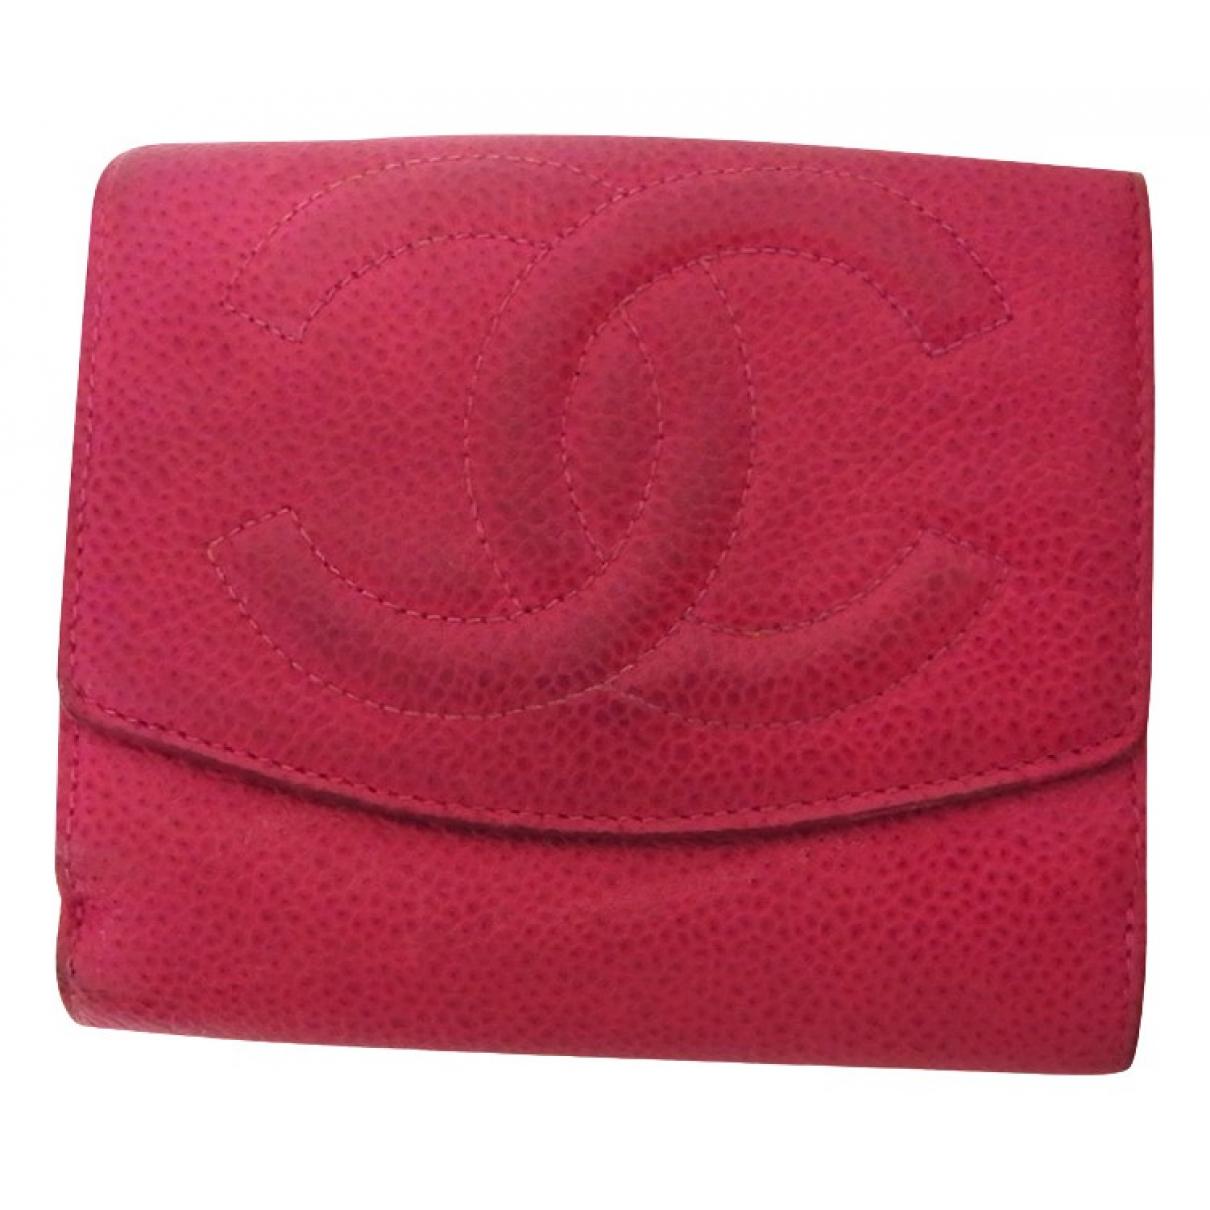 Chanel \N Portemonnaie Rot